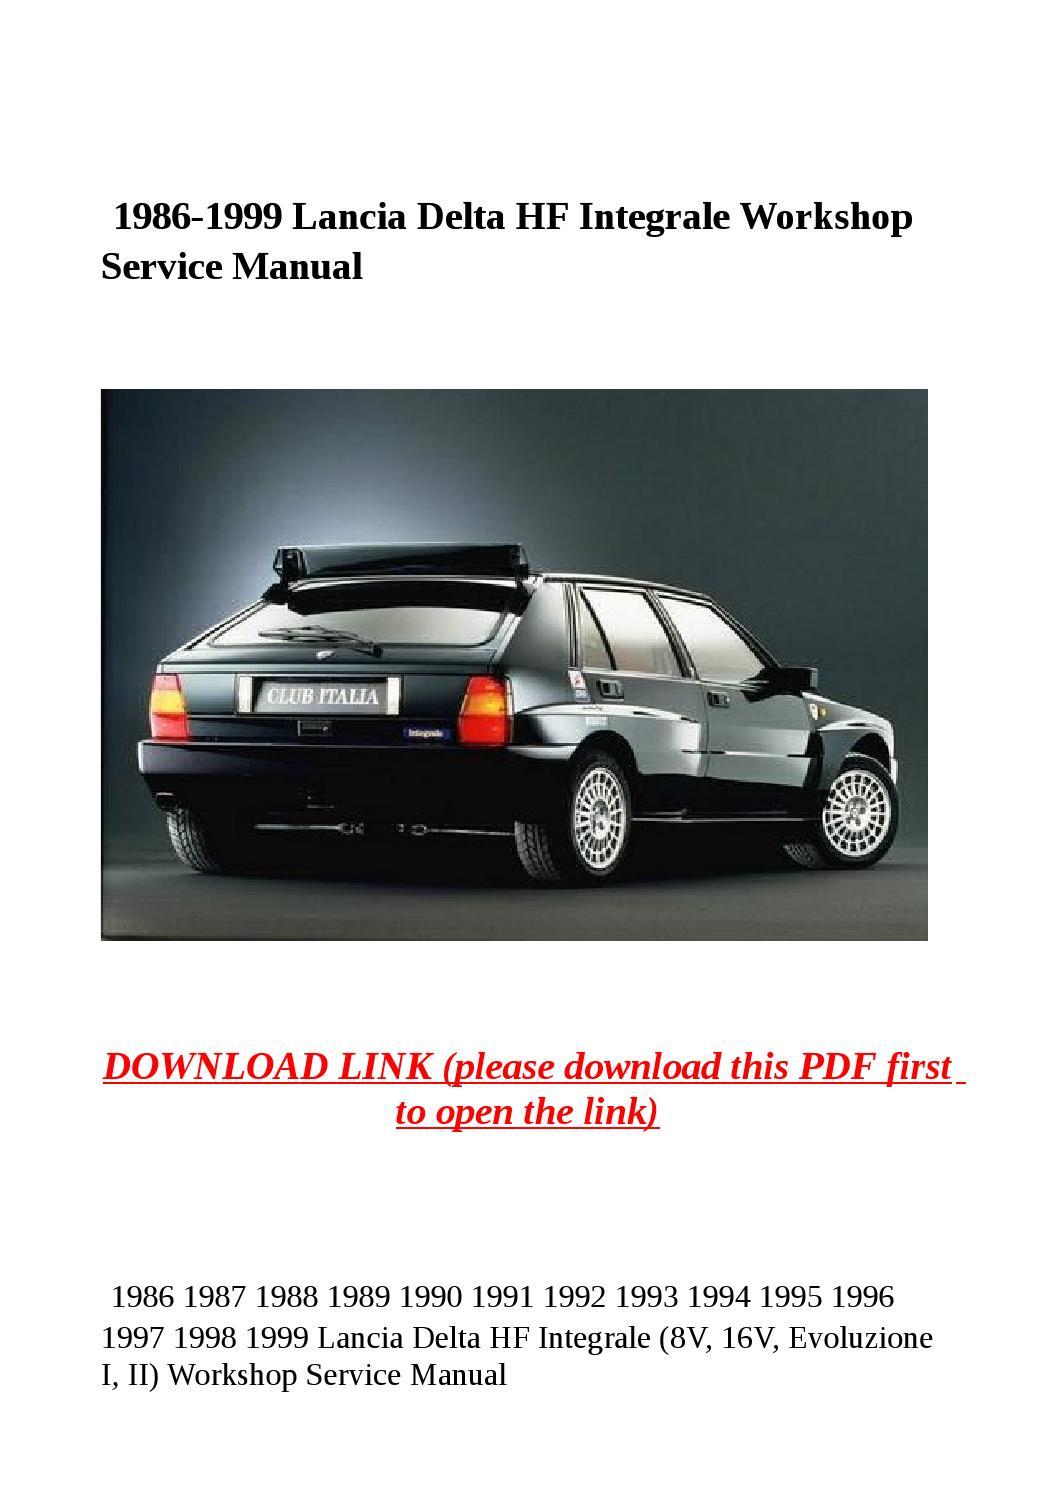 1986 1999 lancia delta hf integrale workshop service manual by steve - issuu